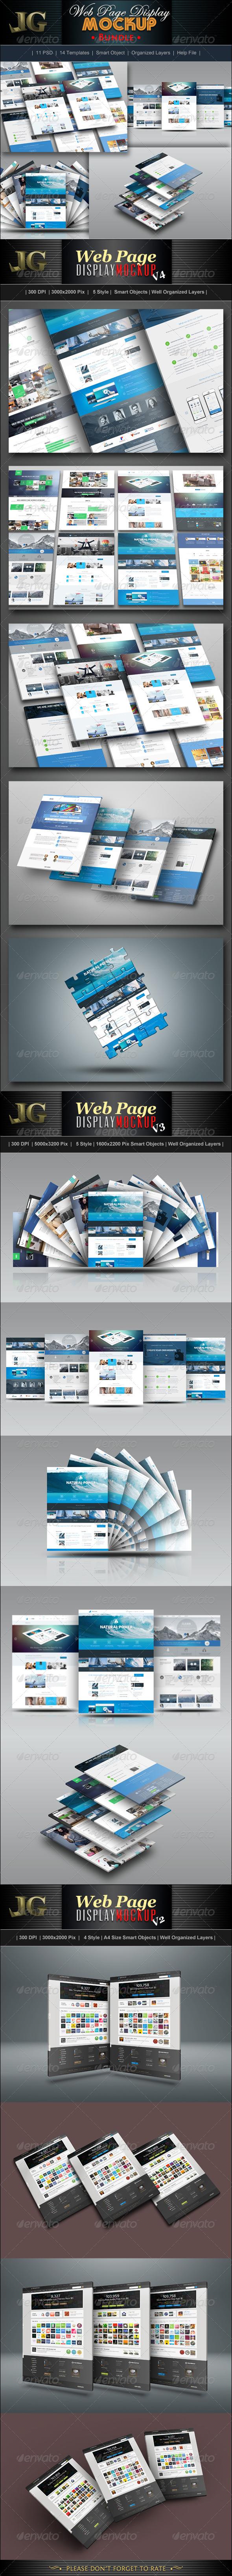 GraphicRiver Website Display Mockup Bundle 7243776